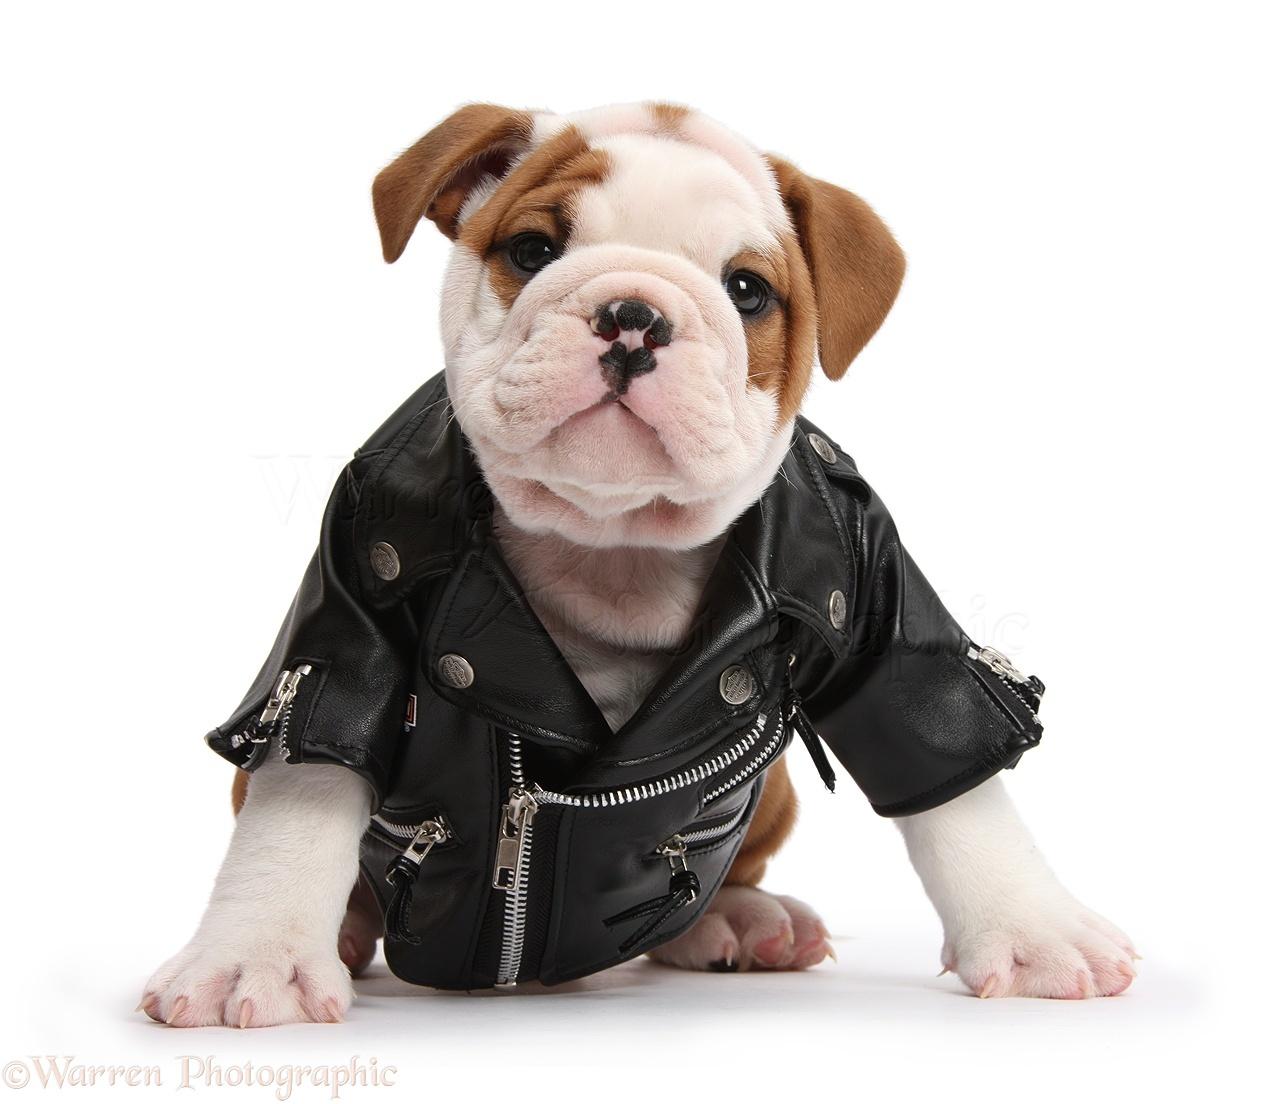 Cute Pets Pictures, Bulldog Puppy Wearing Biker Jacket